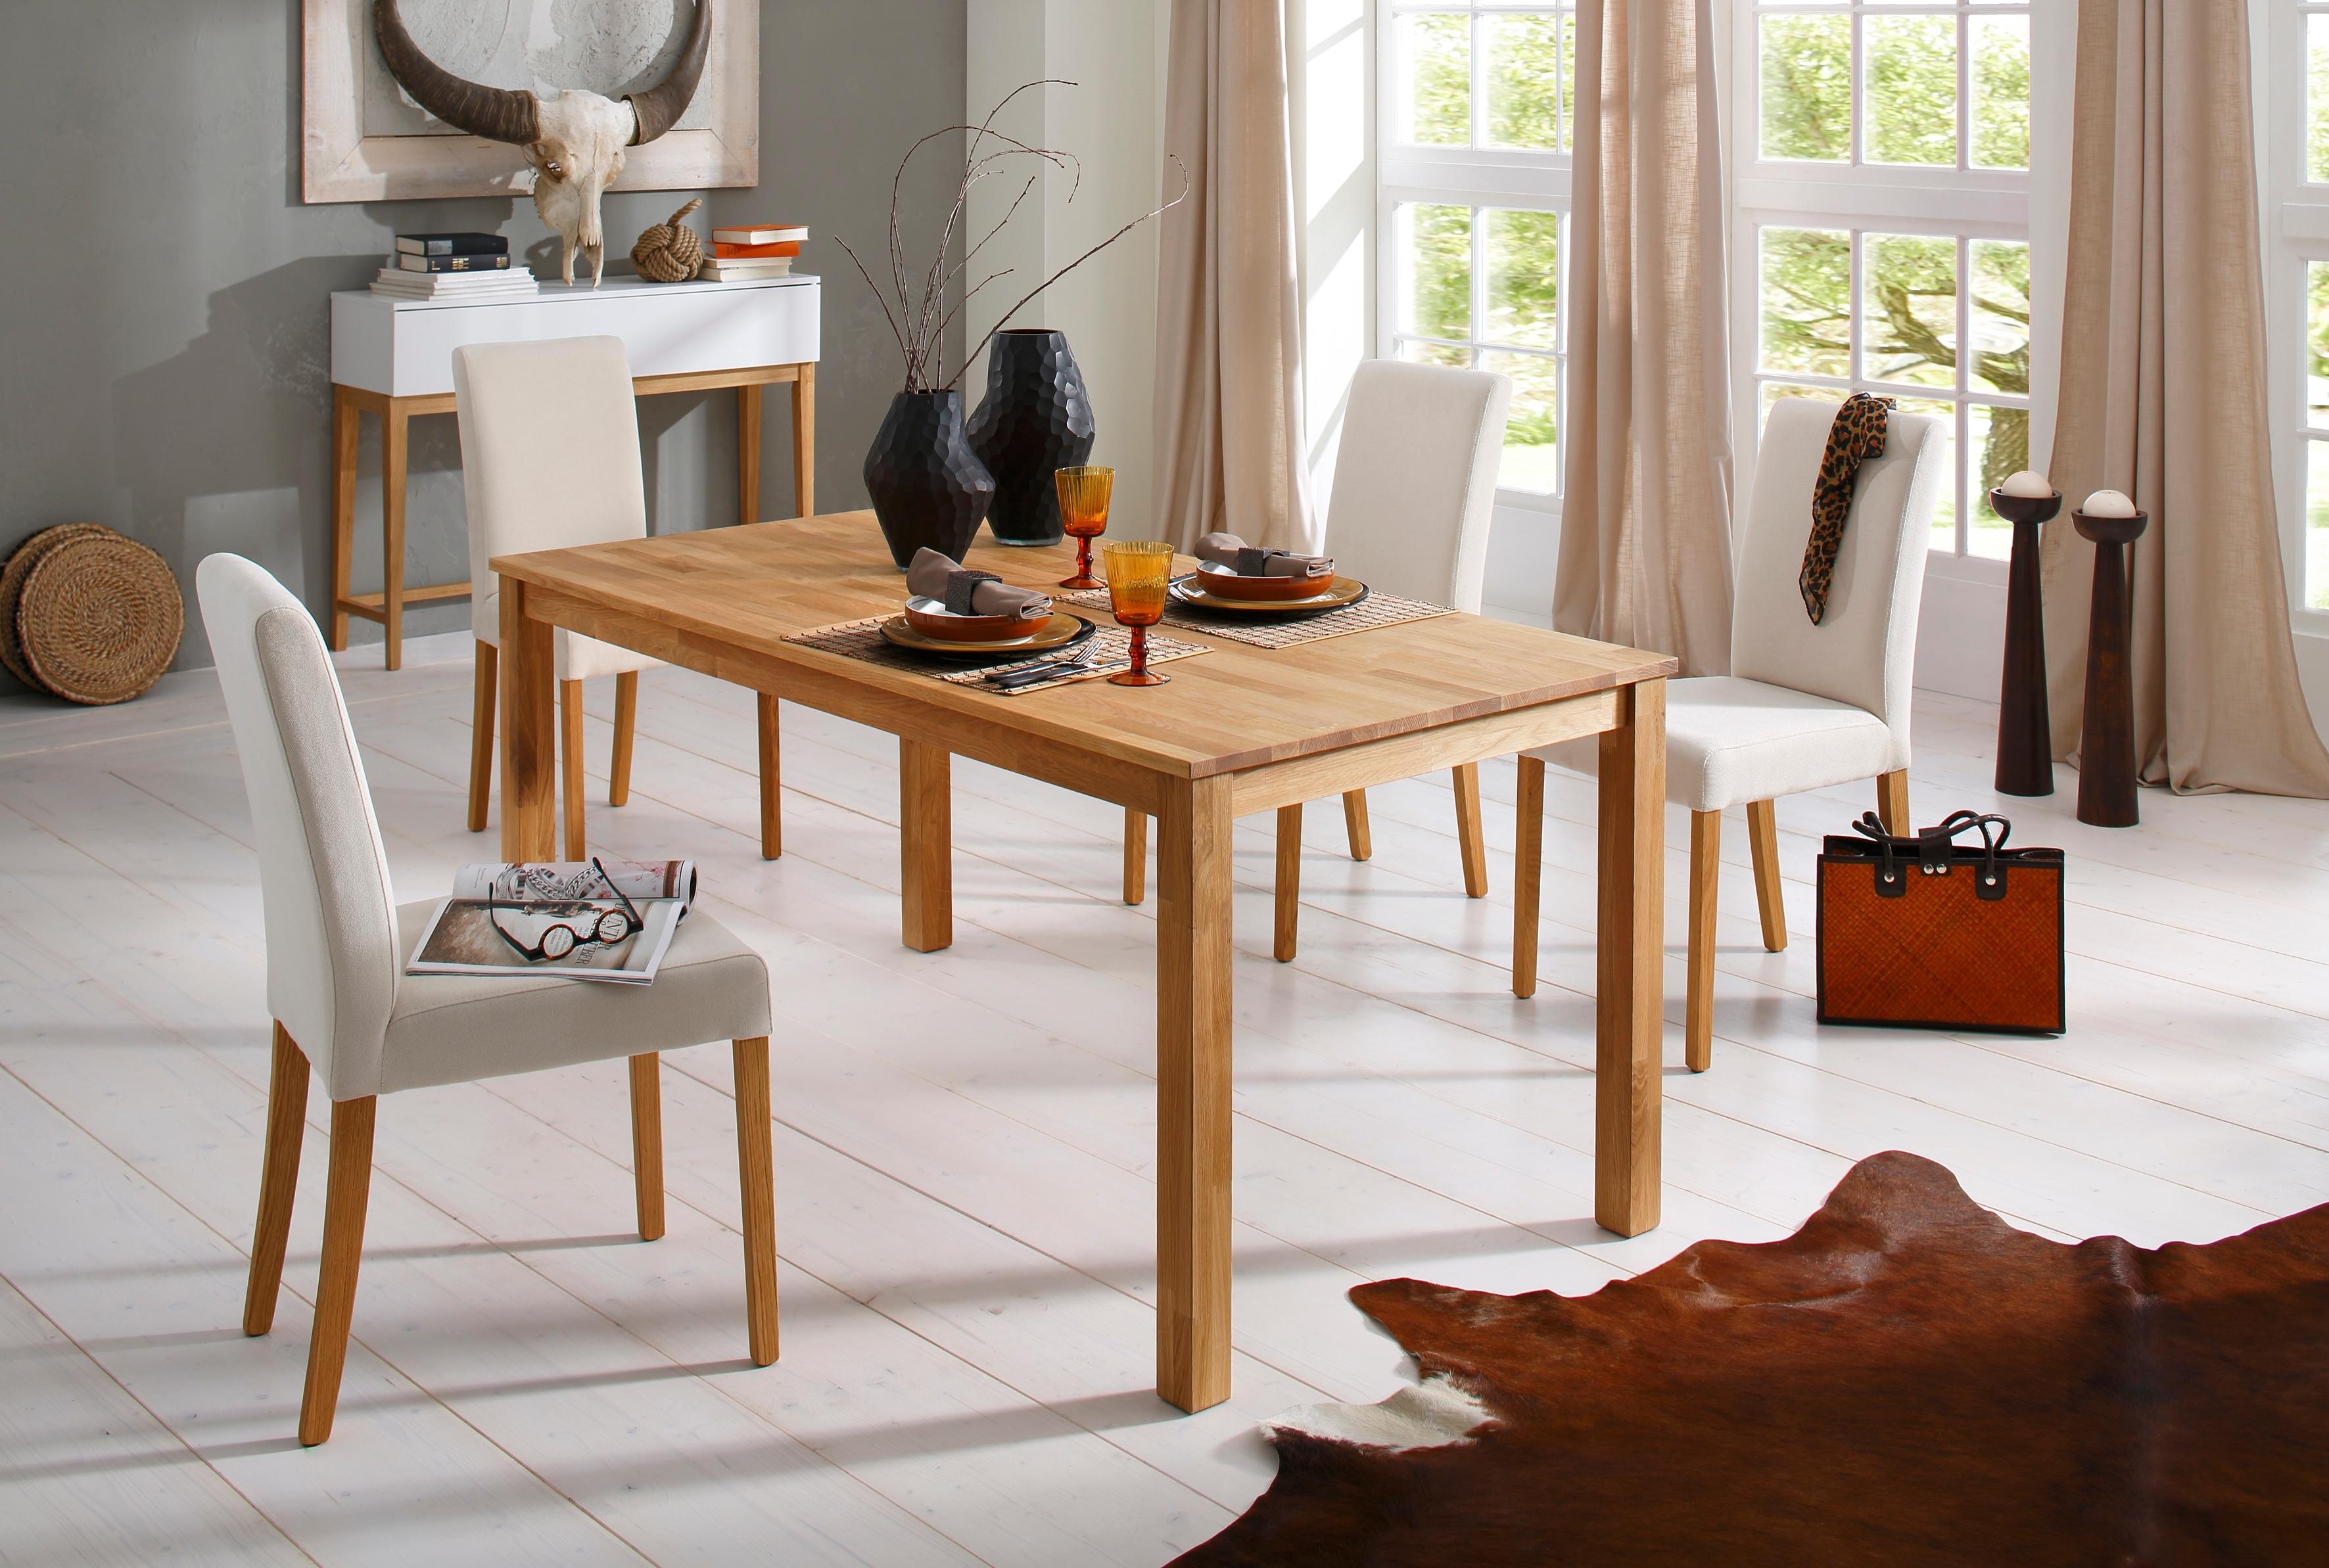 home affaire stoel in set van 2 4 of 6 online shoppen otto. Black Bedroom Furniture Sets. Home Design Ideas